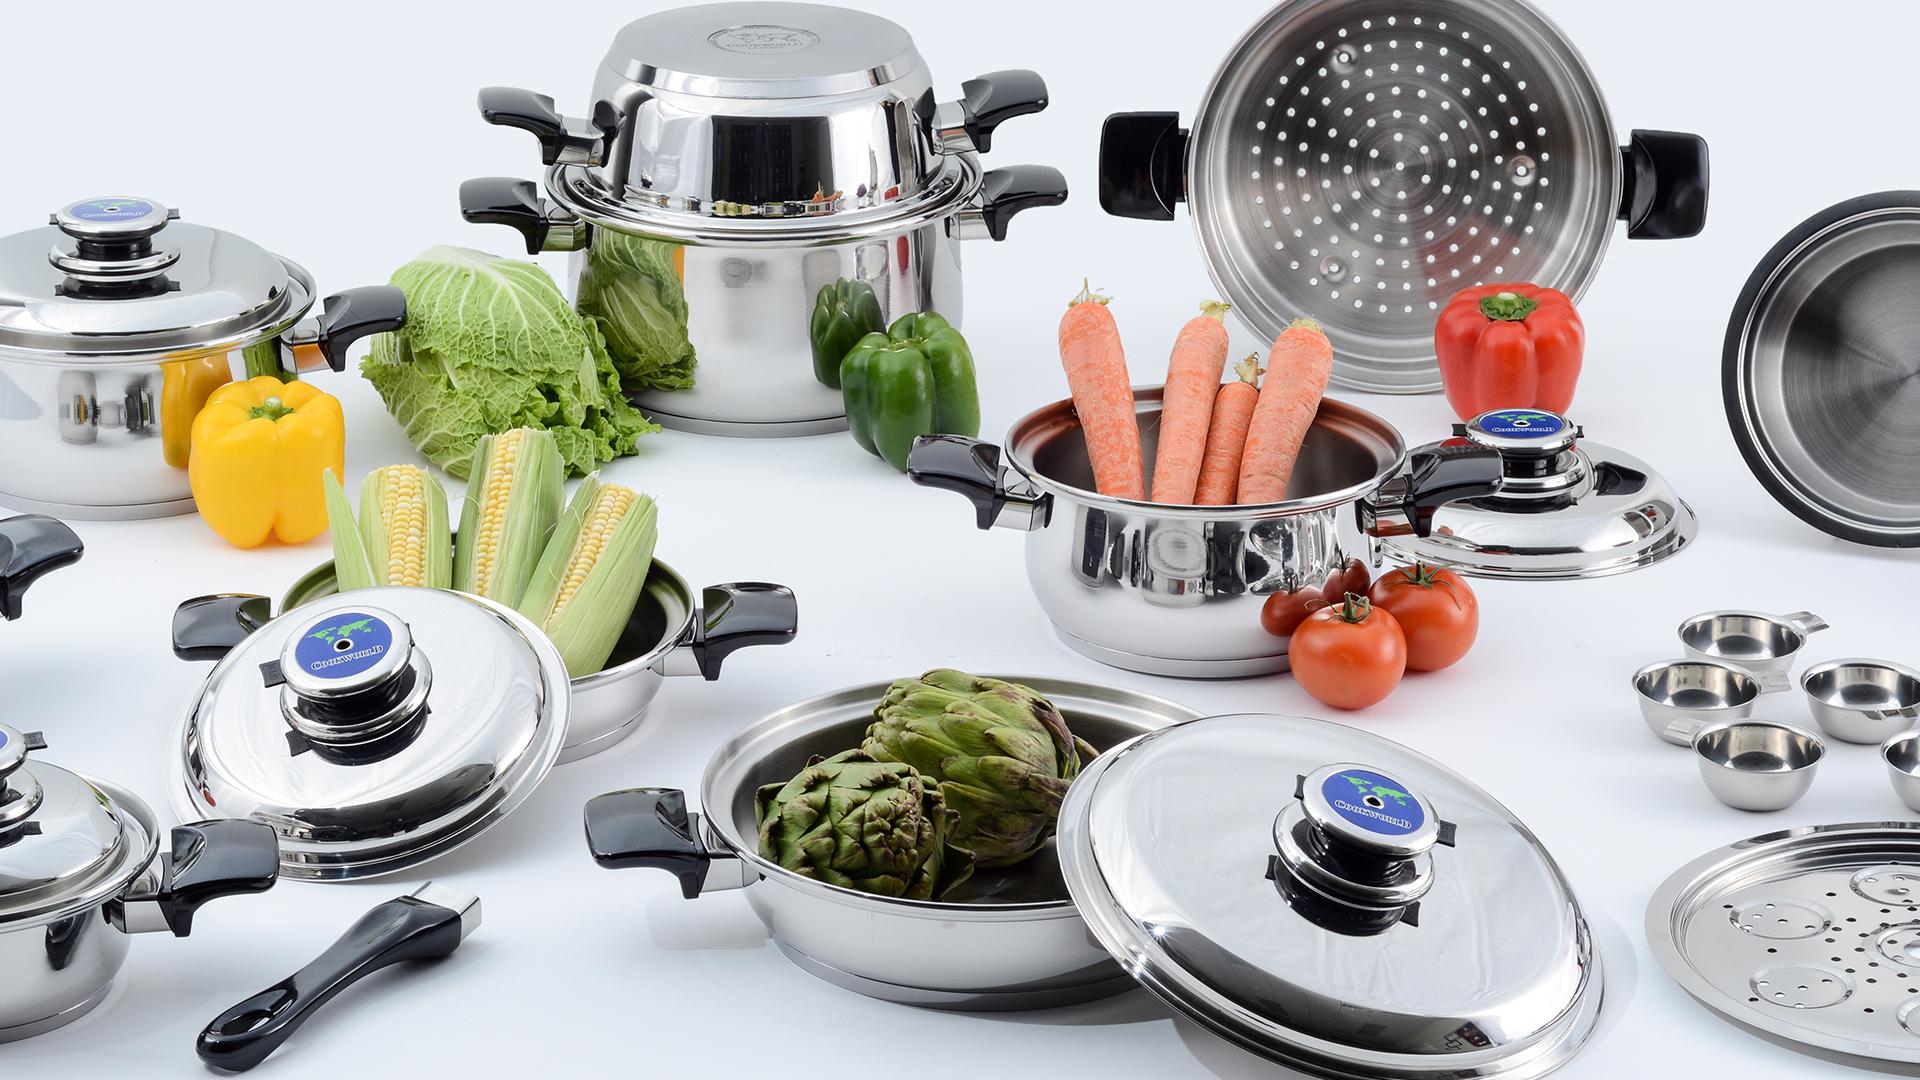 Cookworld USA - Visit WebsiteWarranty Info